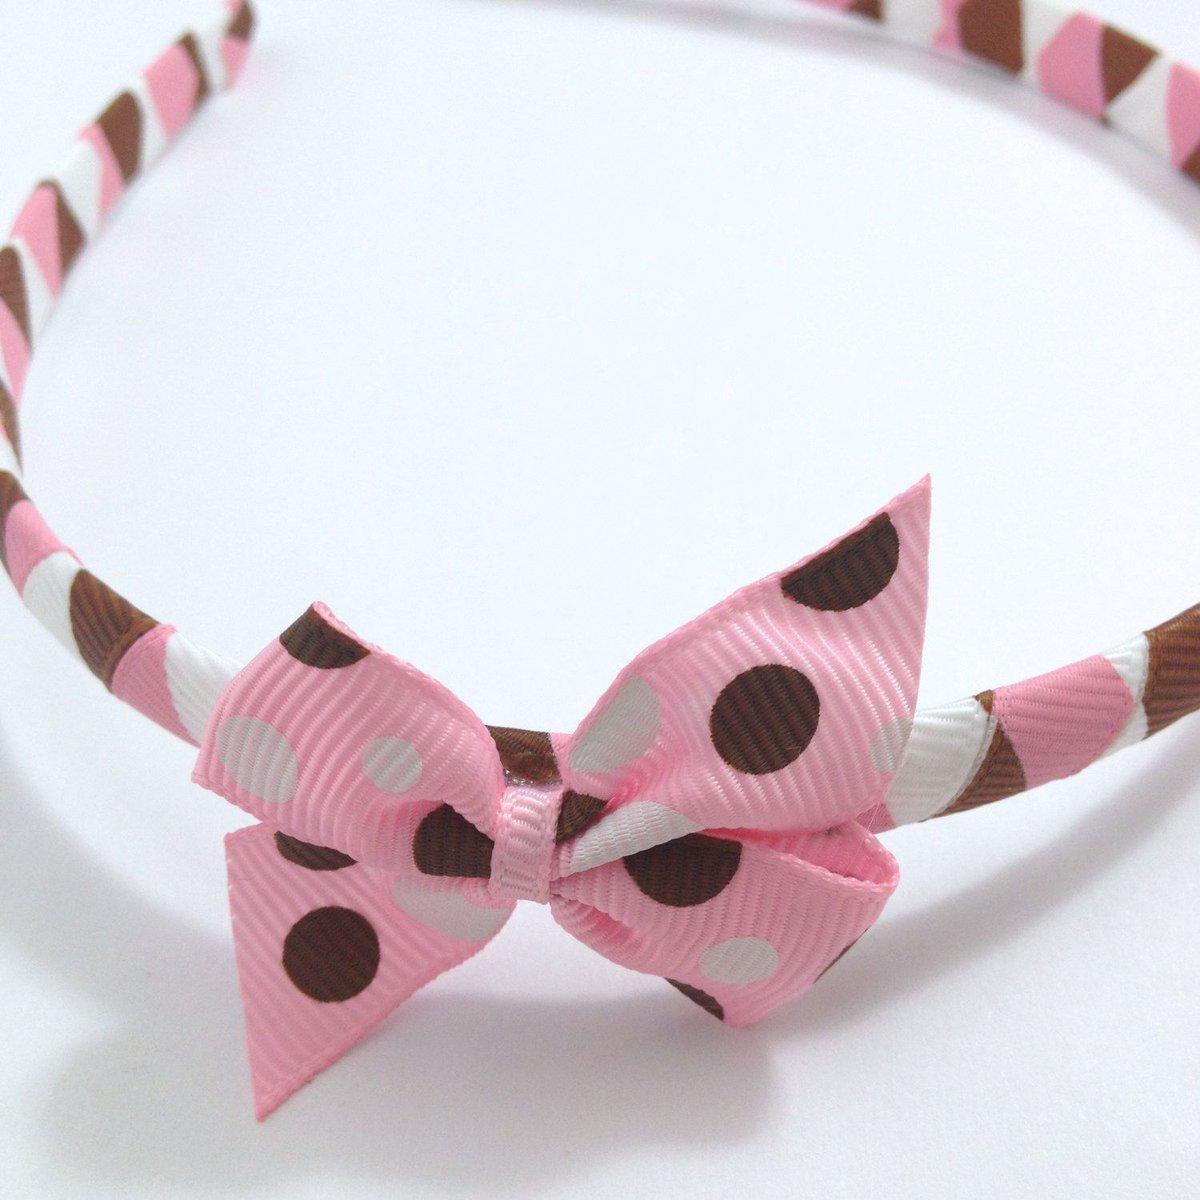 Pink, Brown, White Dots Pinwheel Hair Bow Headband  http:// buff.ly/2tiqFhK  &nbsp;   #handmade #etsy #flowerheadband #hairflower #etsyhandmade #pink<br>http://pic.twitter.com/g1CuRL7LDb